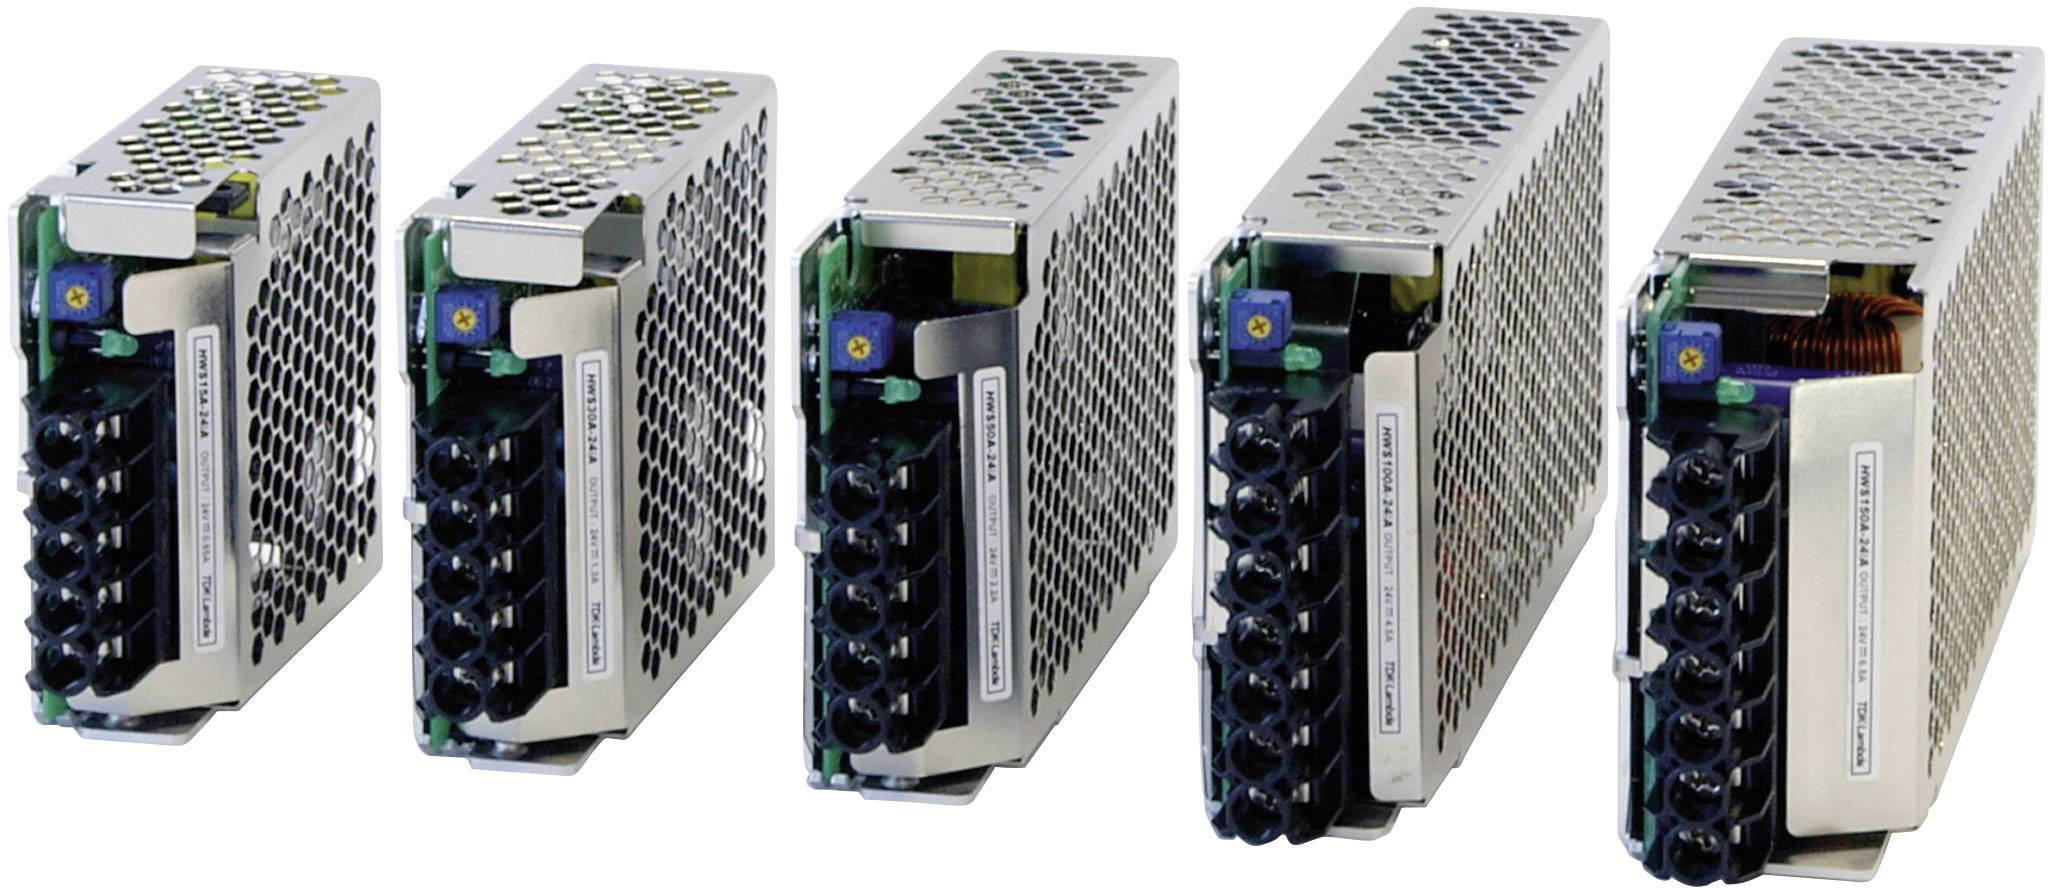 Zabudovateľný napájací zdroj TDK-Lambda HWS-15A-48/A, 48 V, 15,8 W